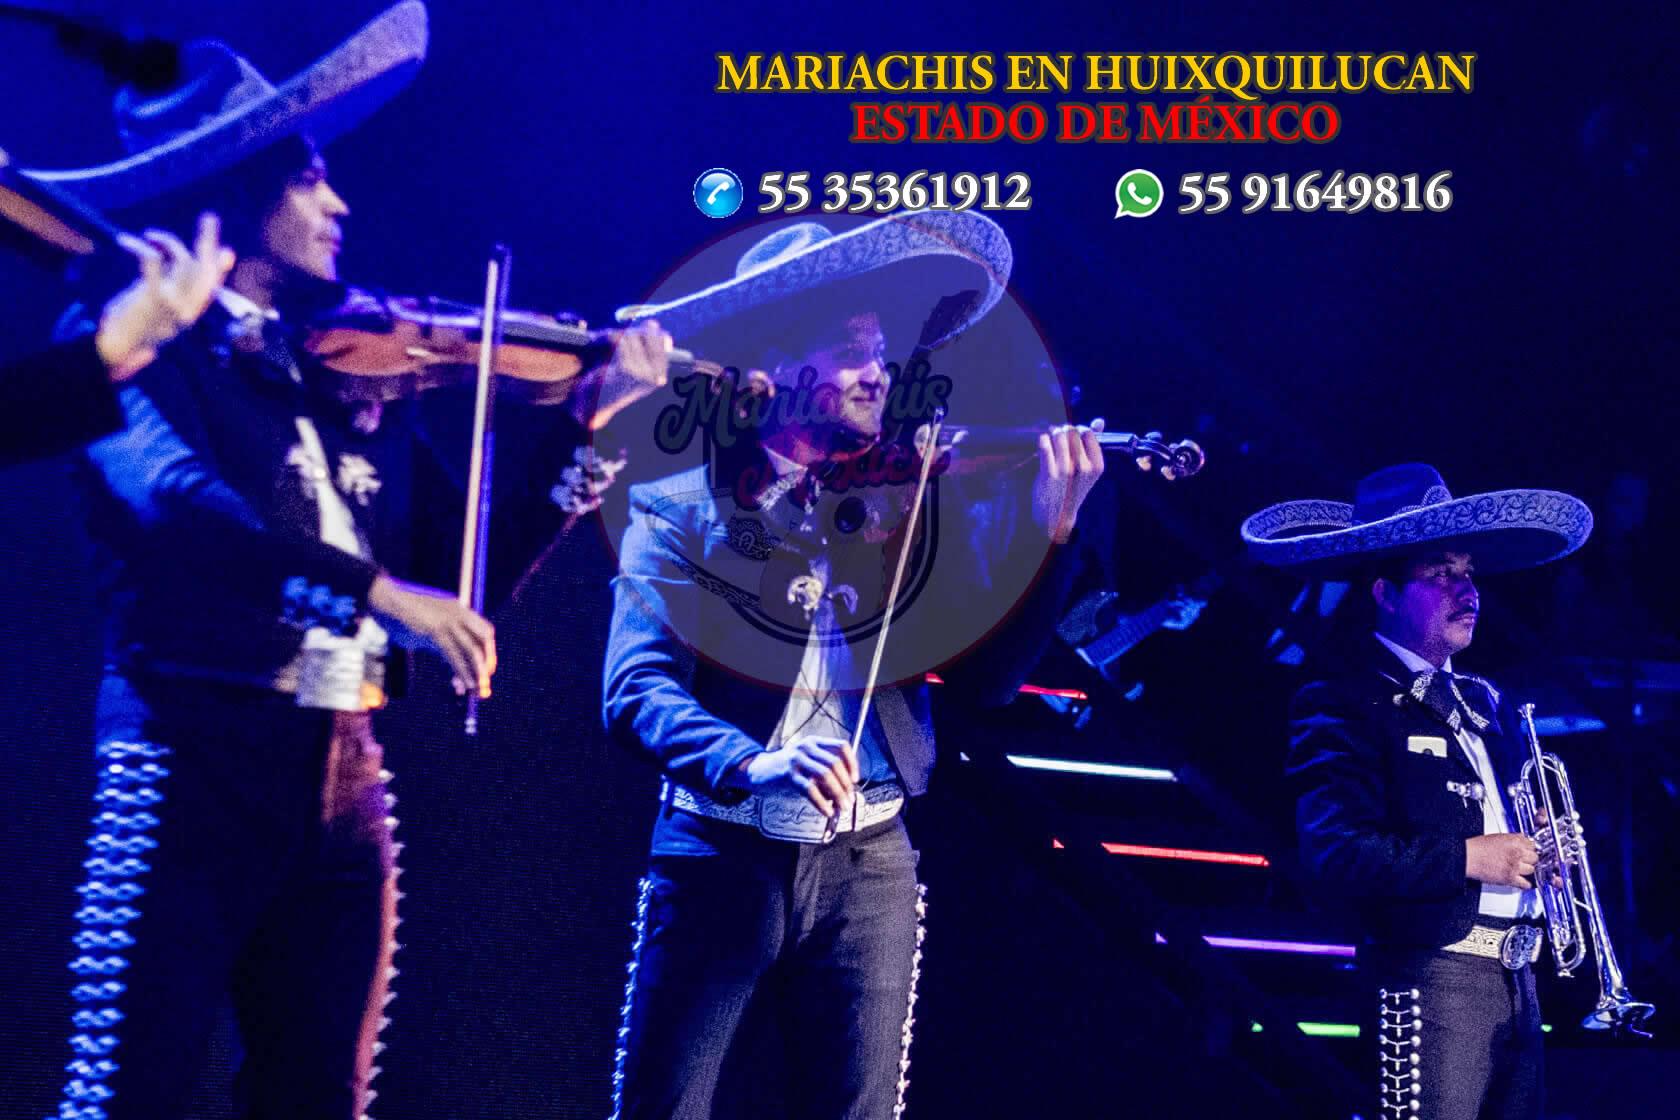 Mariachis en Huixquilucan